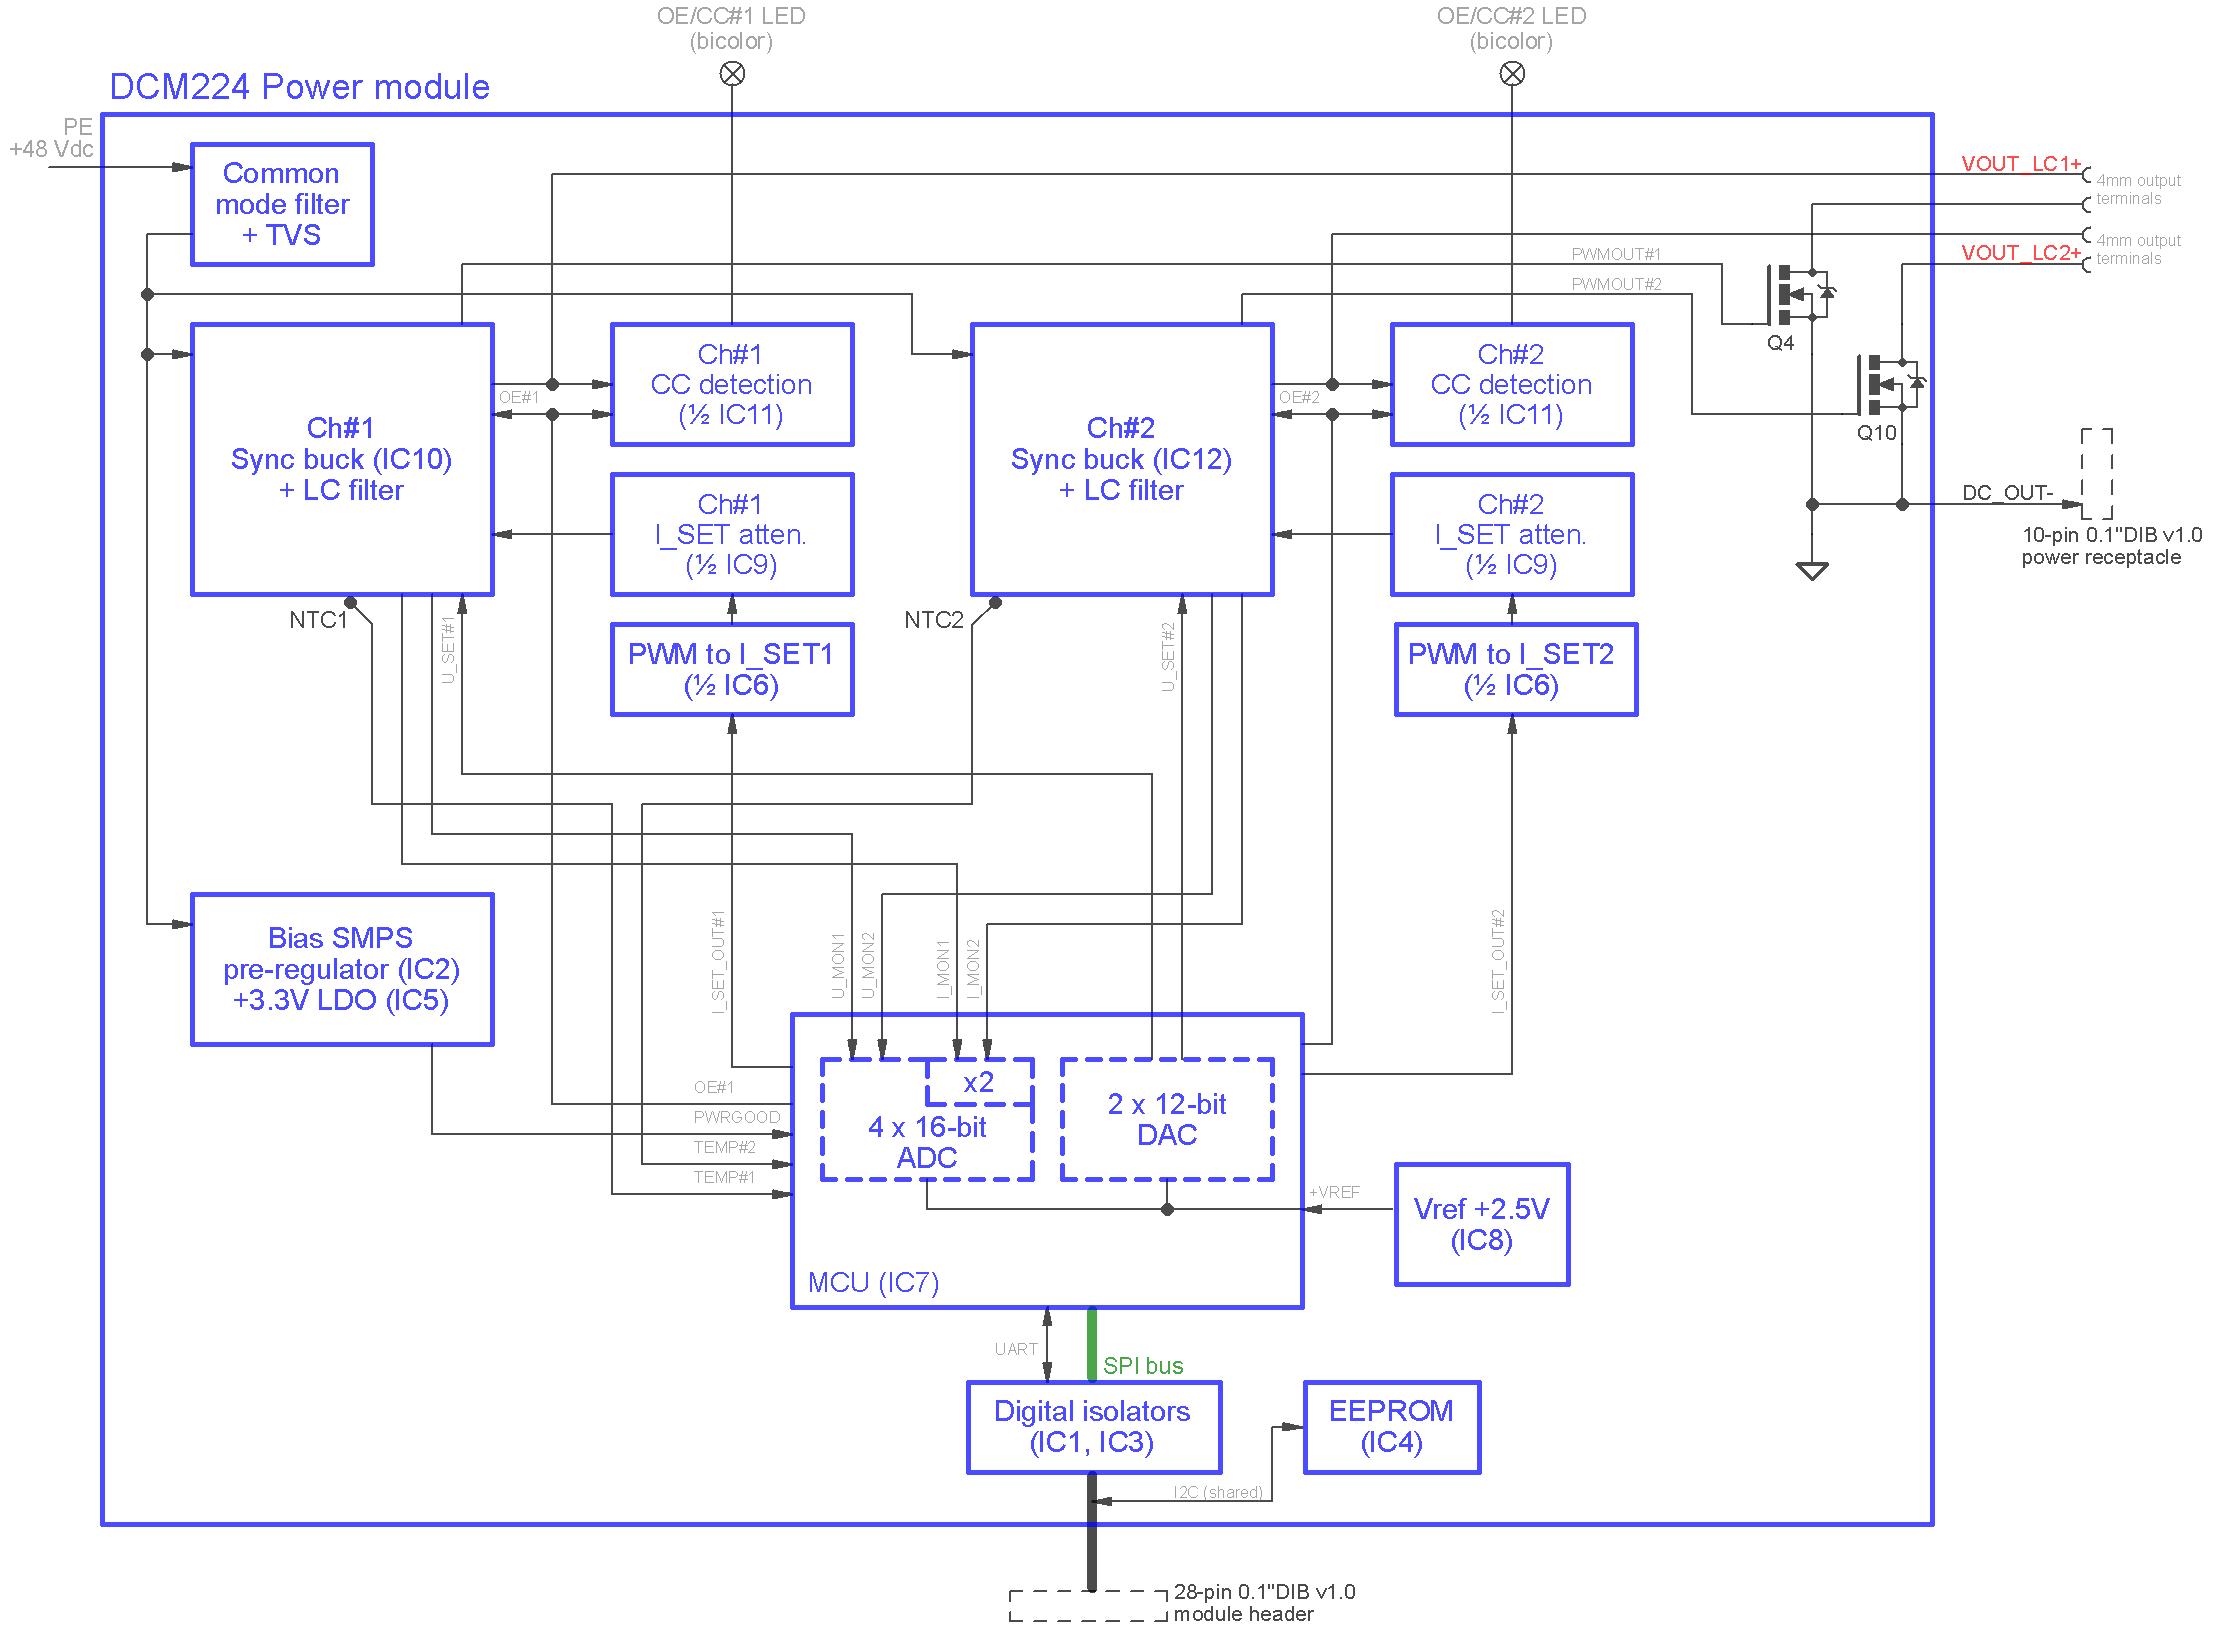 dcm224 diagram.png